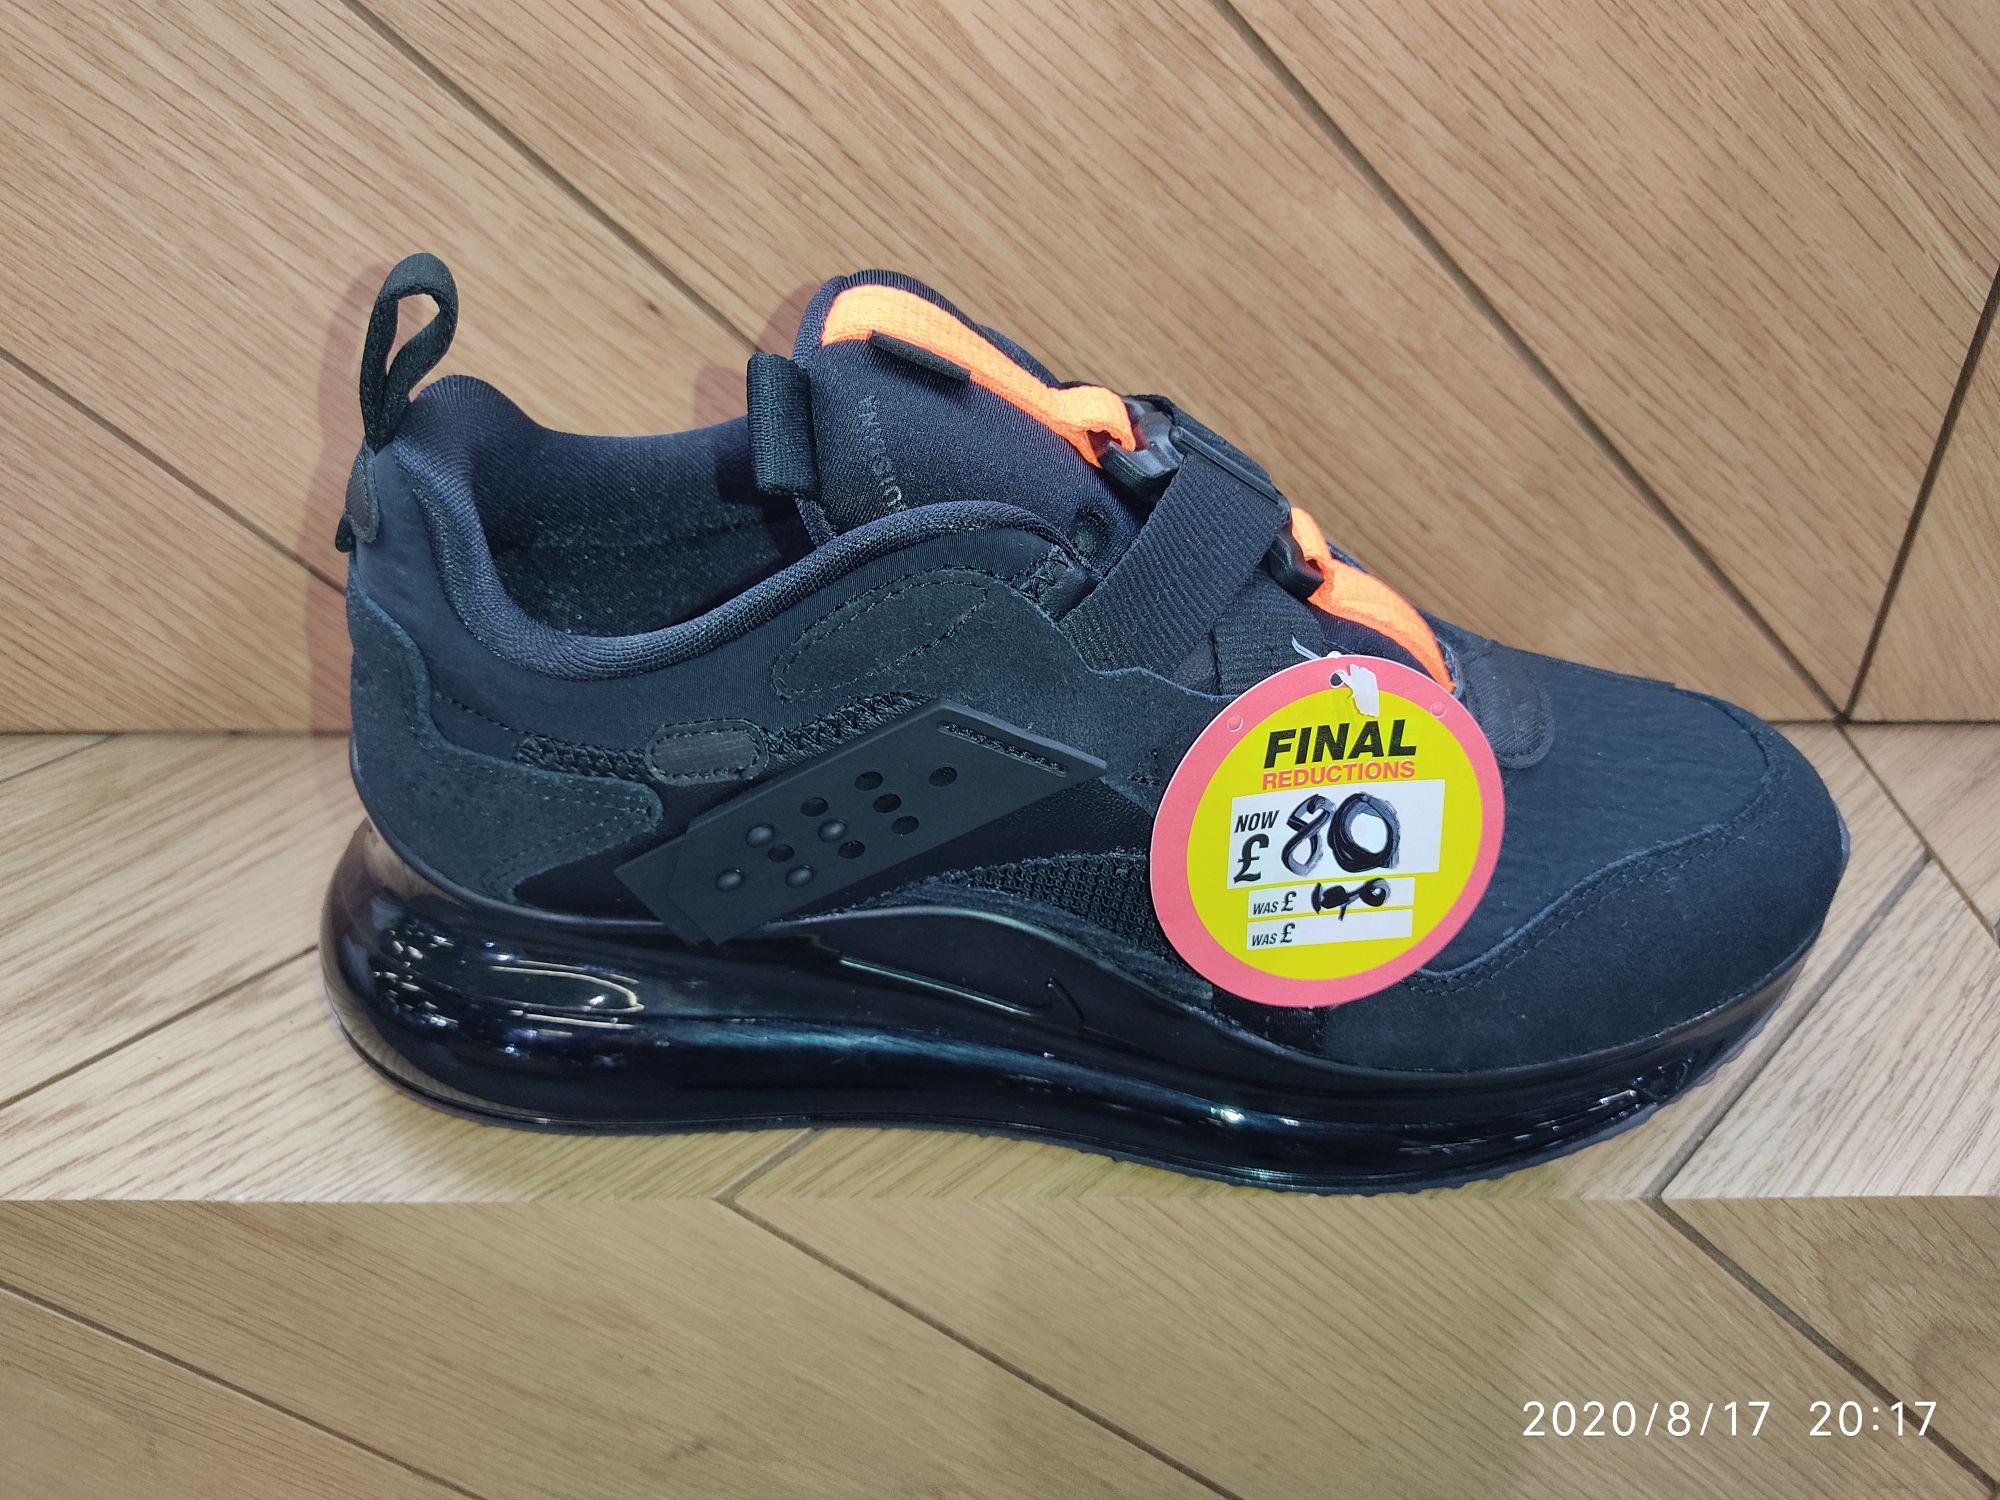 Nike Air Max 720 OBJ slip £80 @ Oxford Street Central London JD Sports